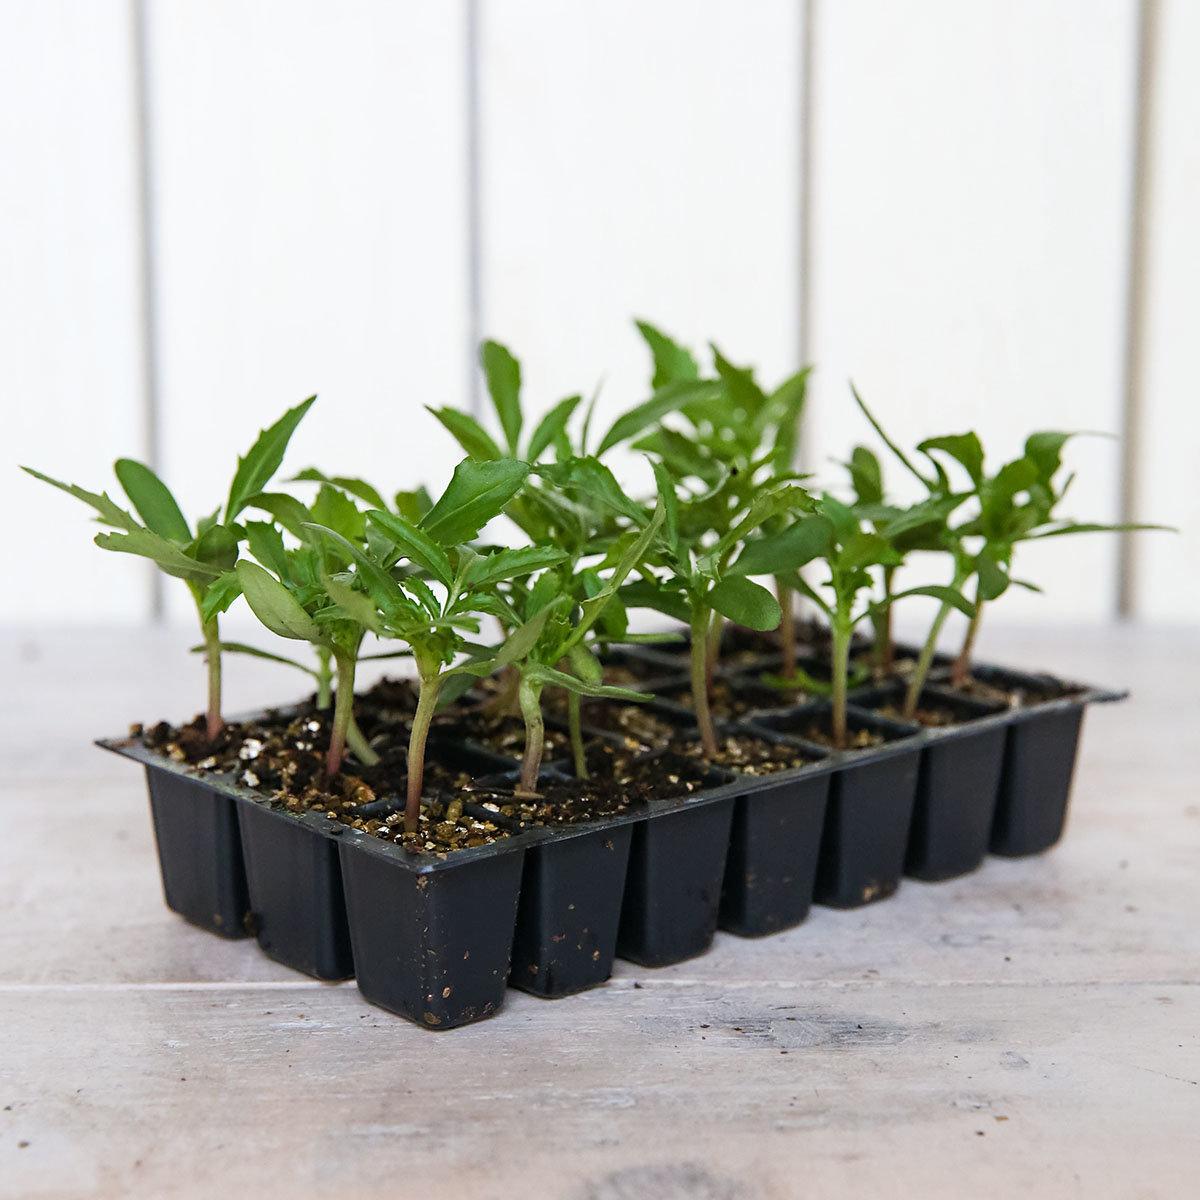 Mini-Jungpflanzen Tagetes Zenith F1-Mischung | #3